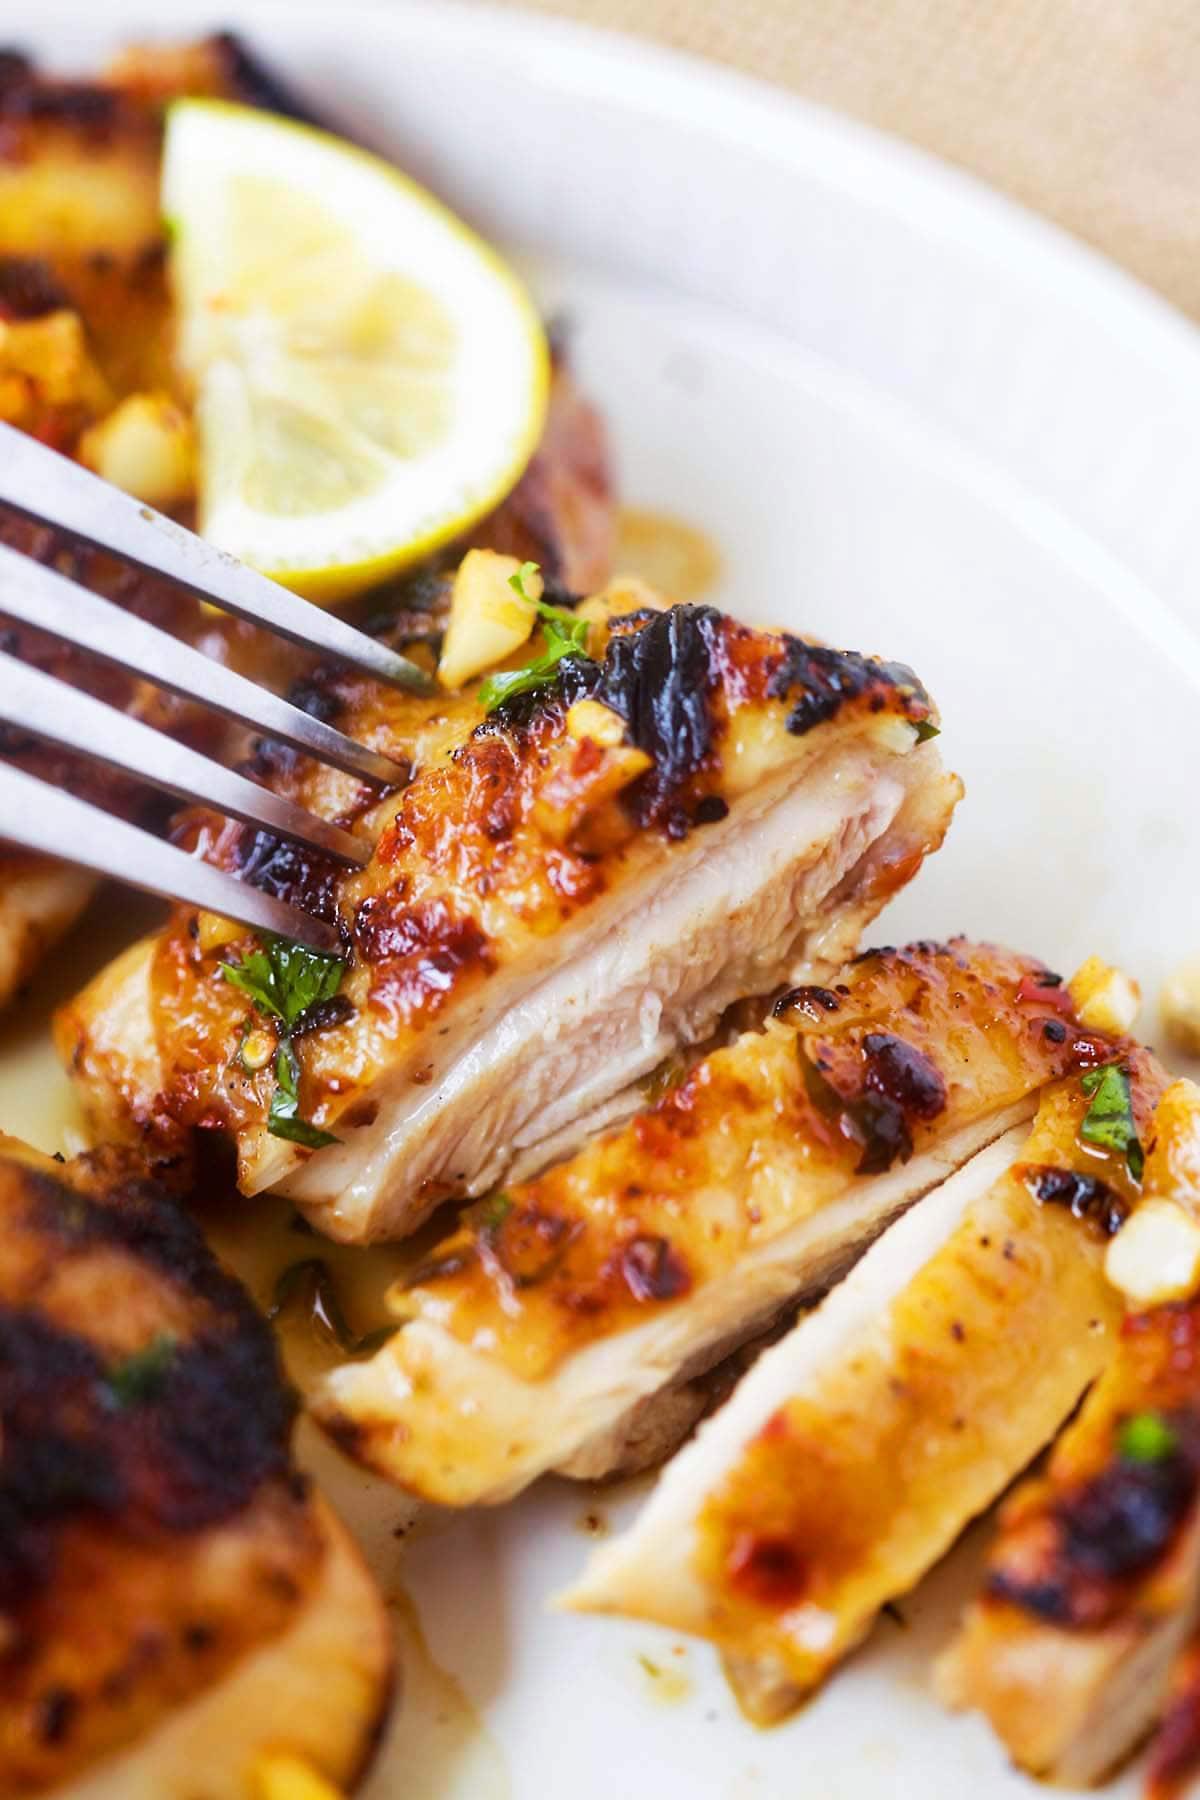 Lemon Garlic Chicken Served On Plate, cut, ready to be eaten.